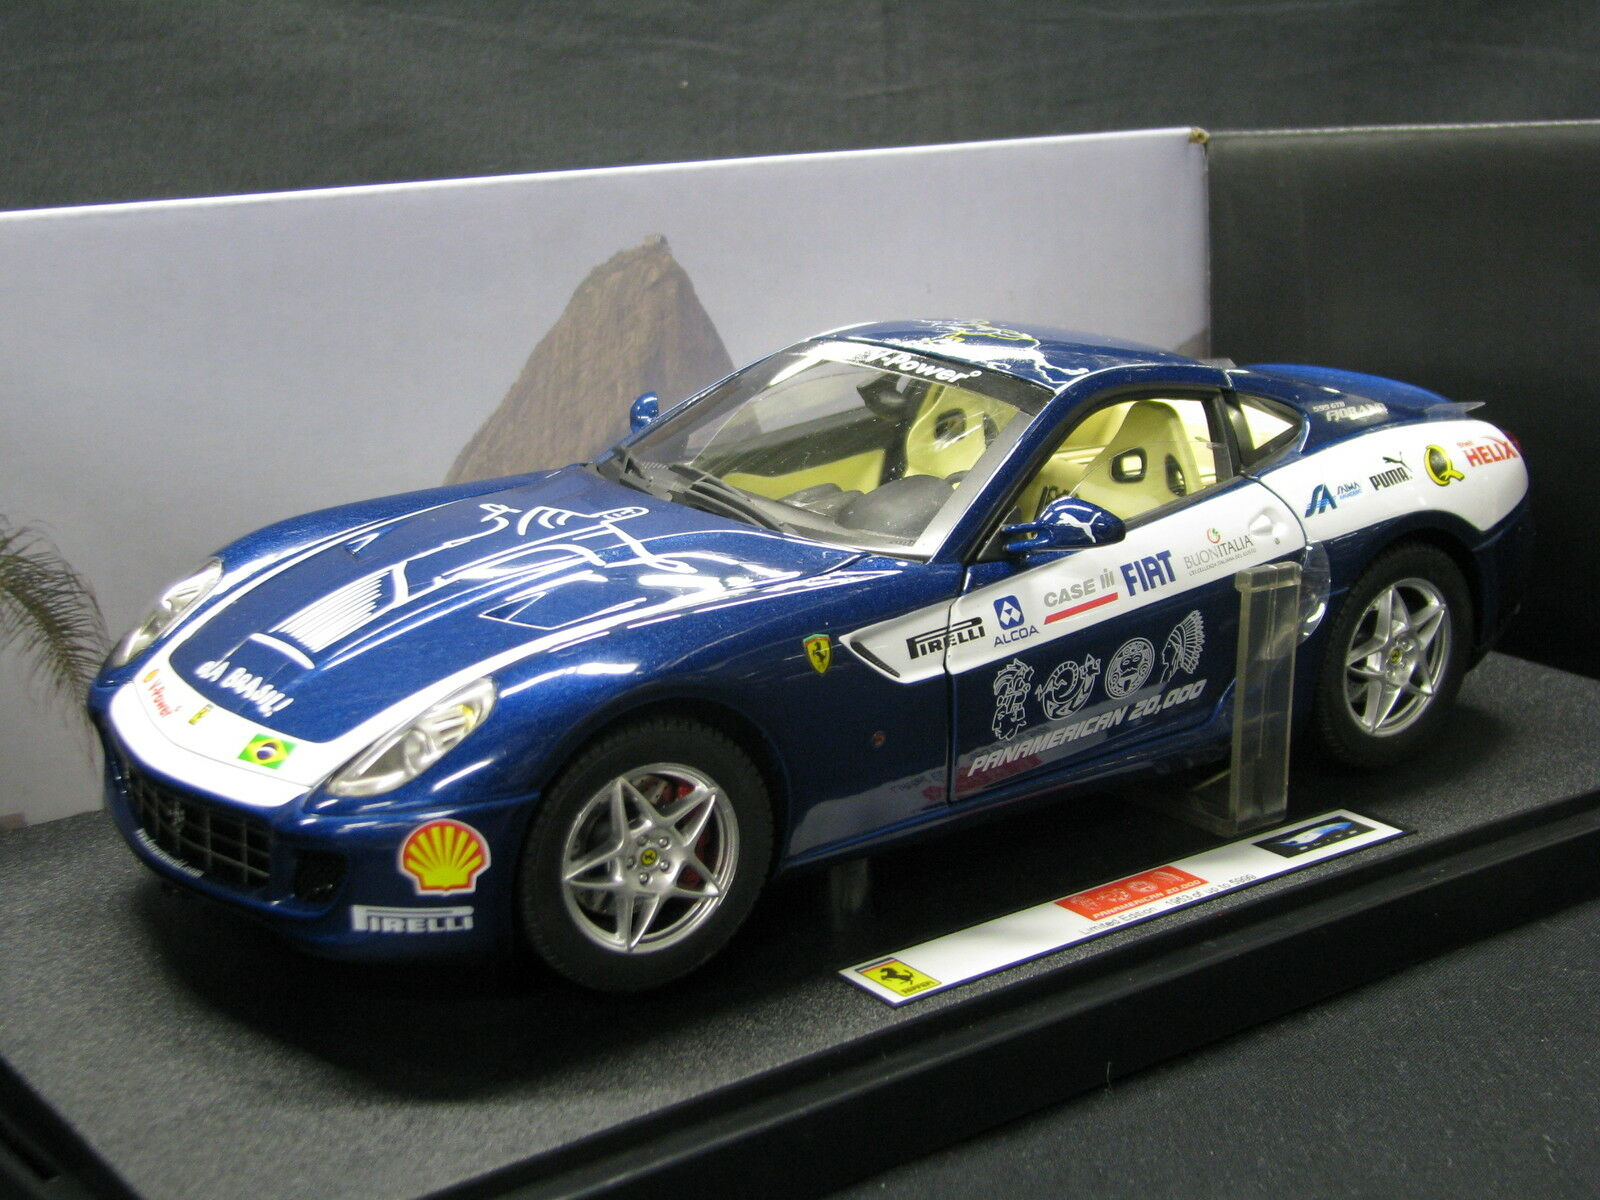 heta hjul Elite Ferrari 599 GTB Firano 2006 1 18 Panamerican (MCC)